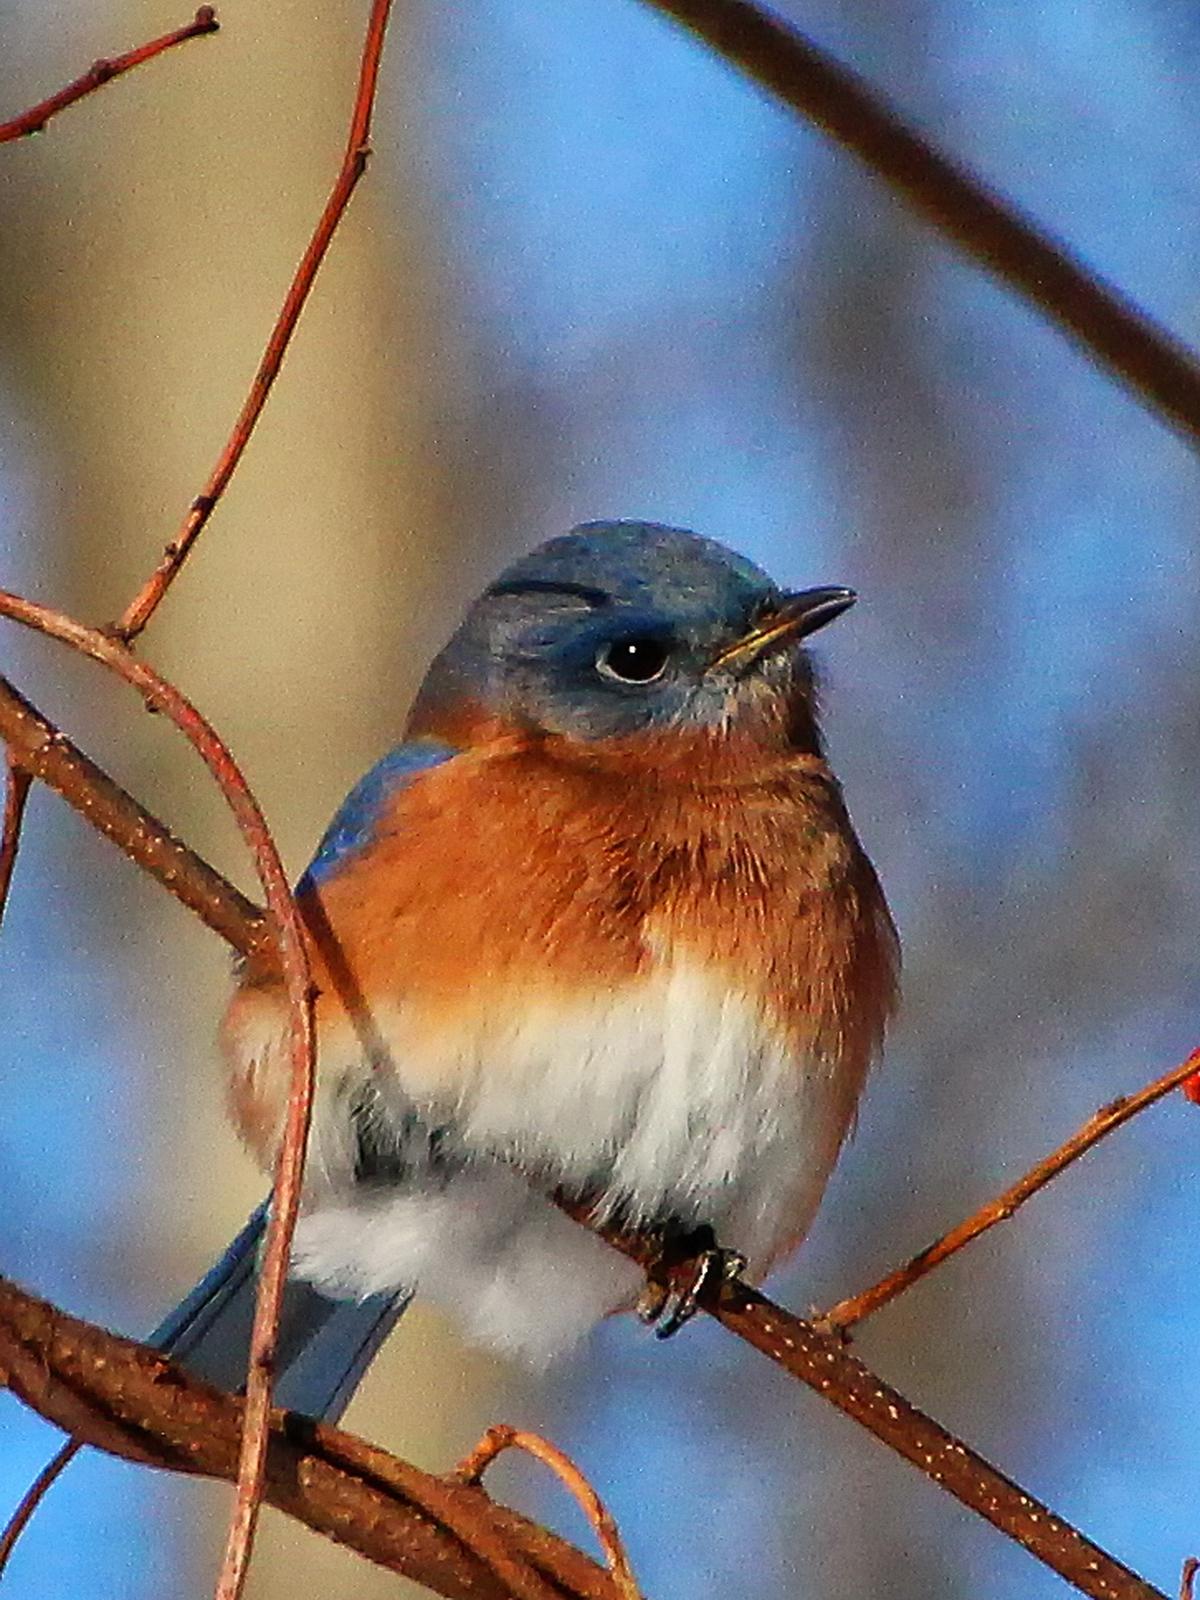 pennsylvania, upper saucon twp, january, bluebirds, berries, woods, , photo